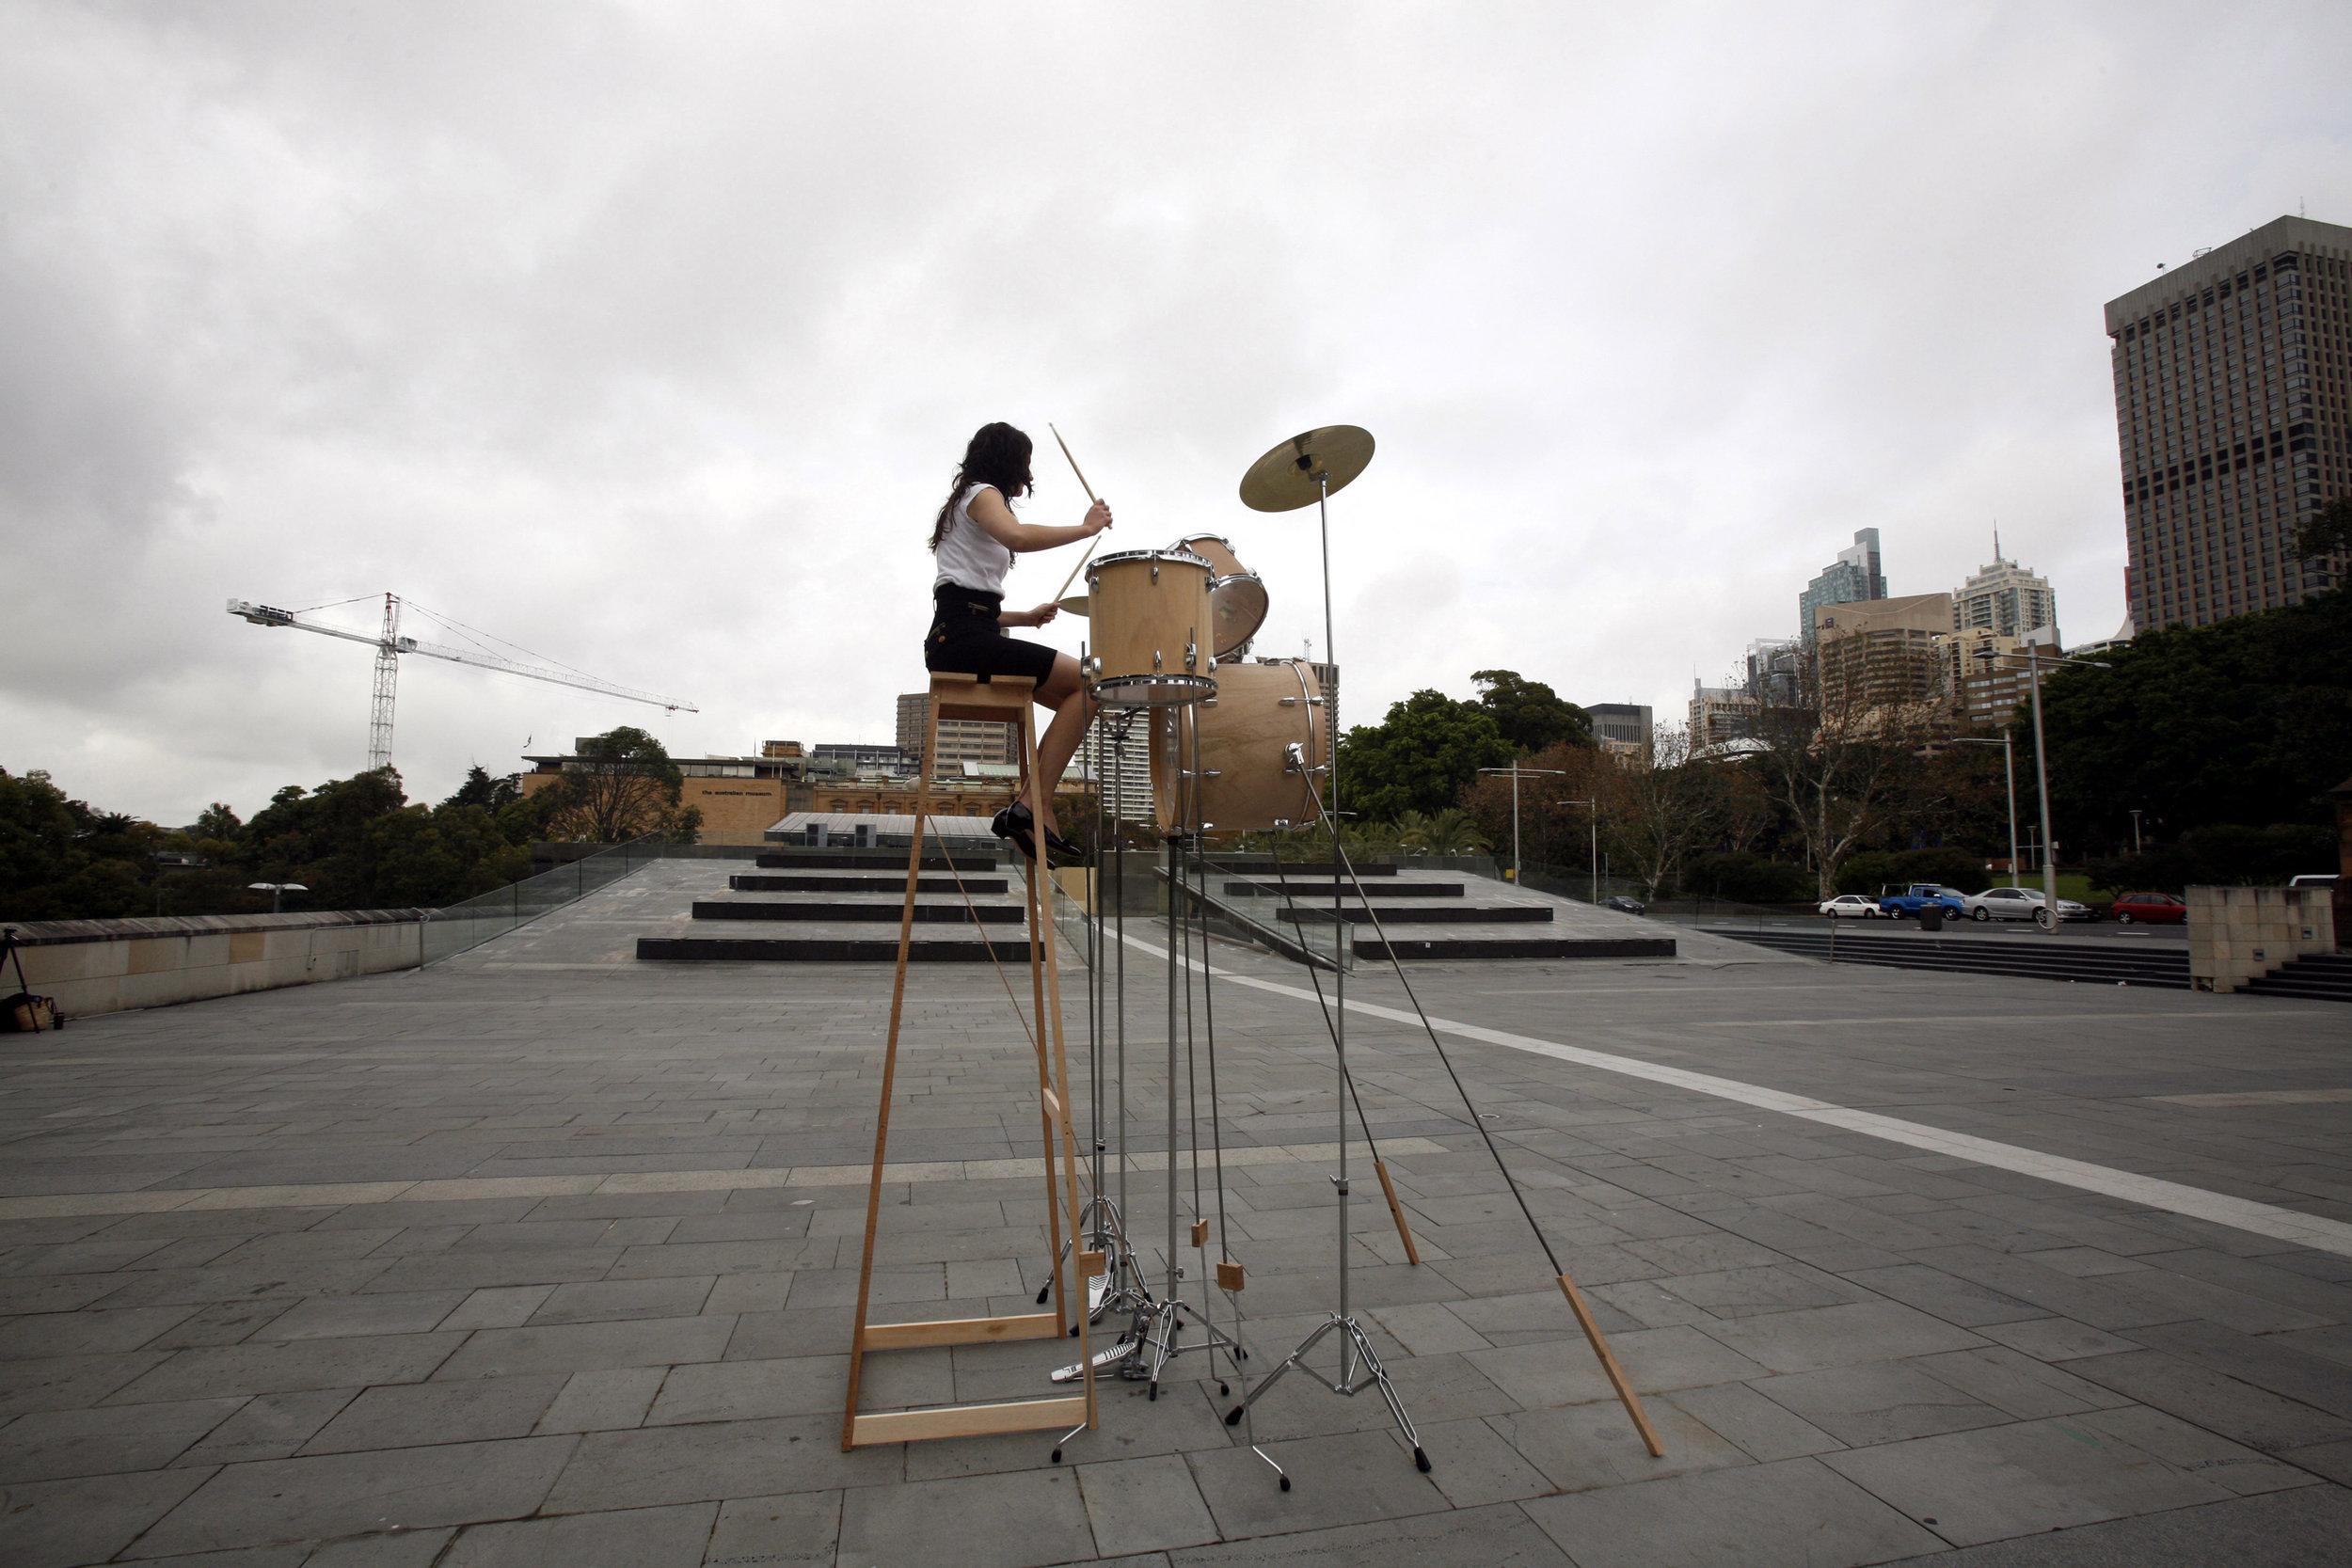 Drum Riser 2008  Performance Still  Image by Jek Maurer  MONA FOMA 2010